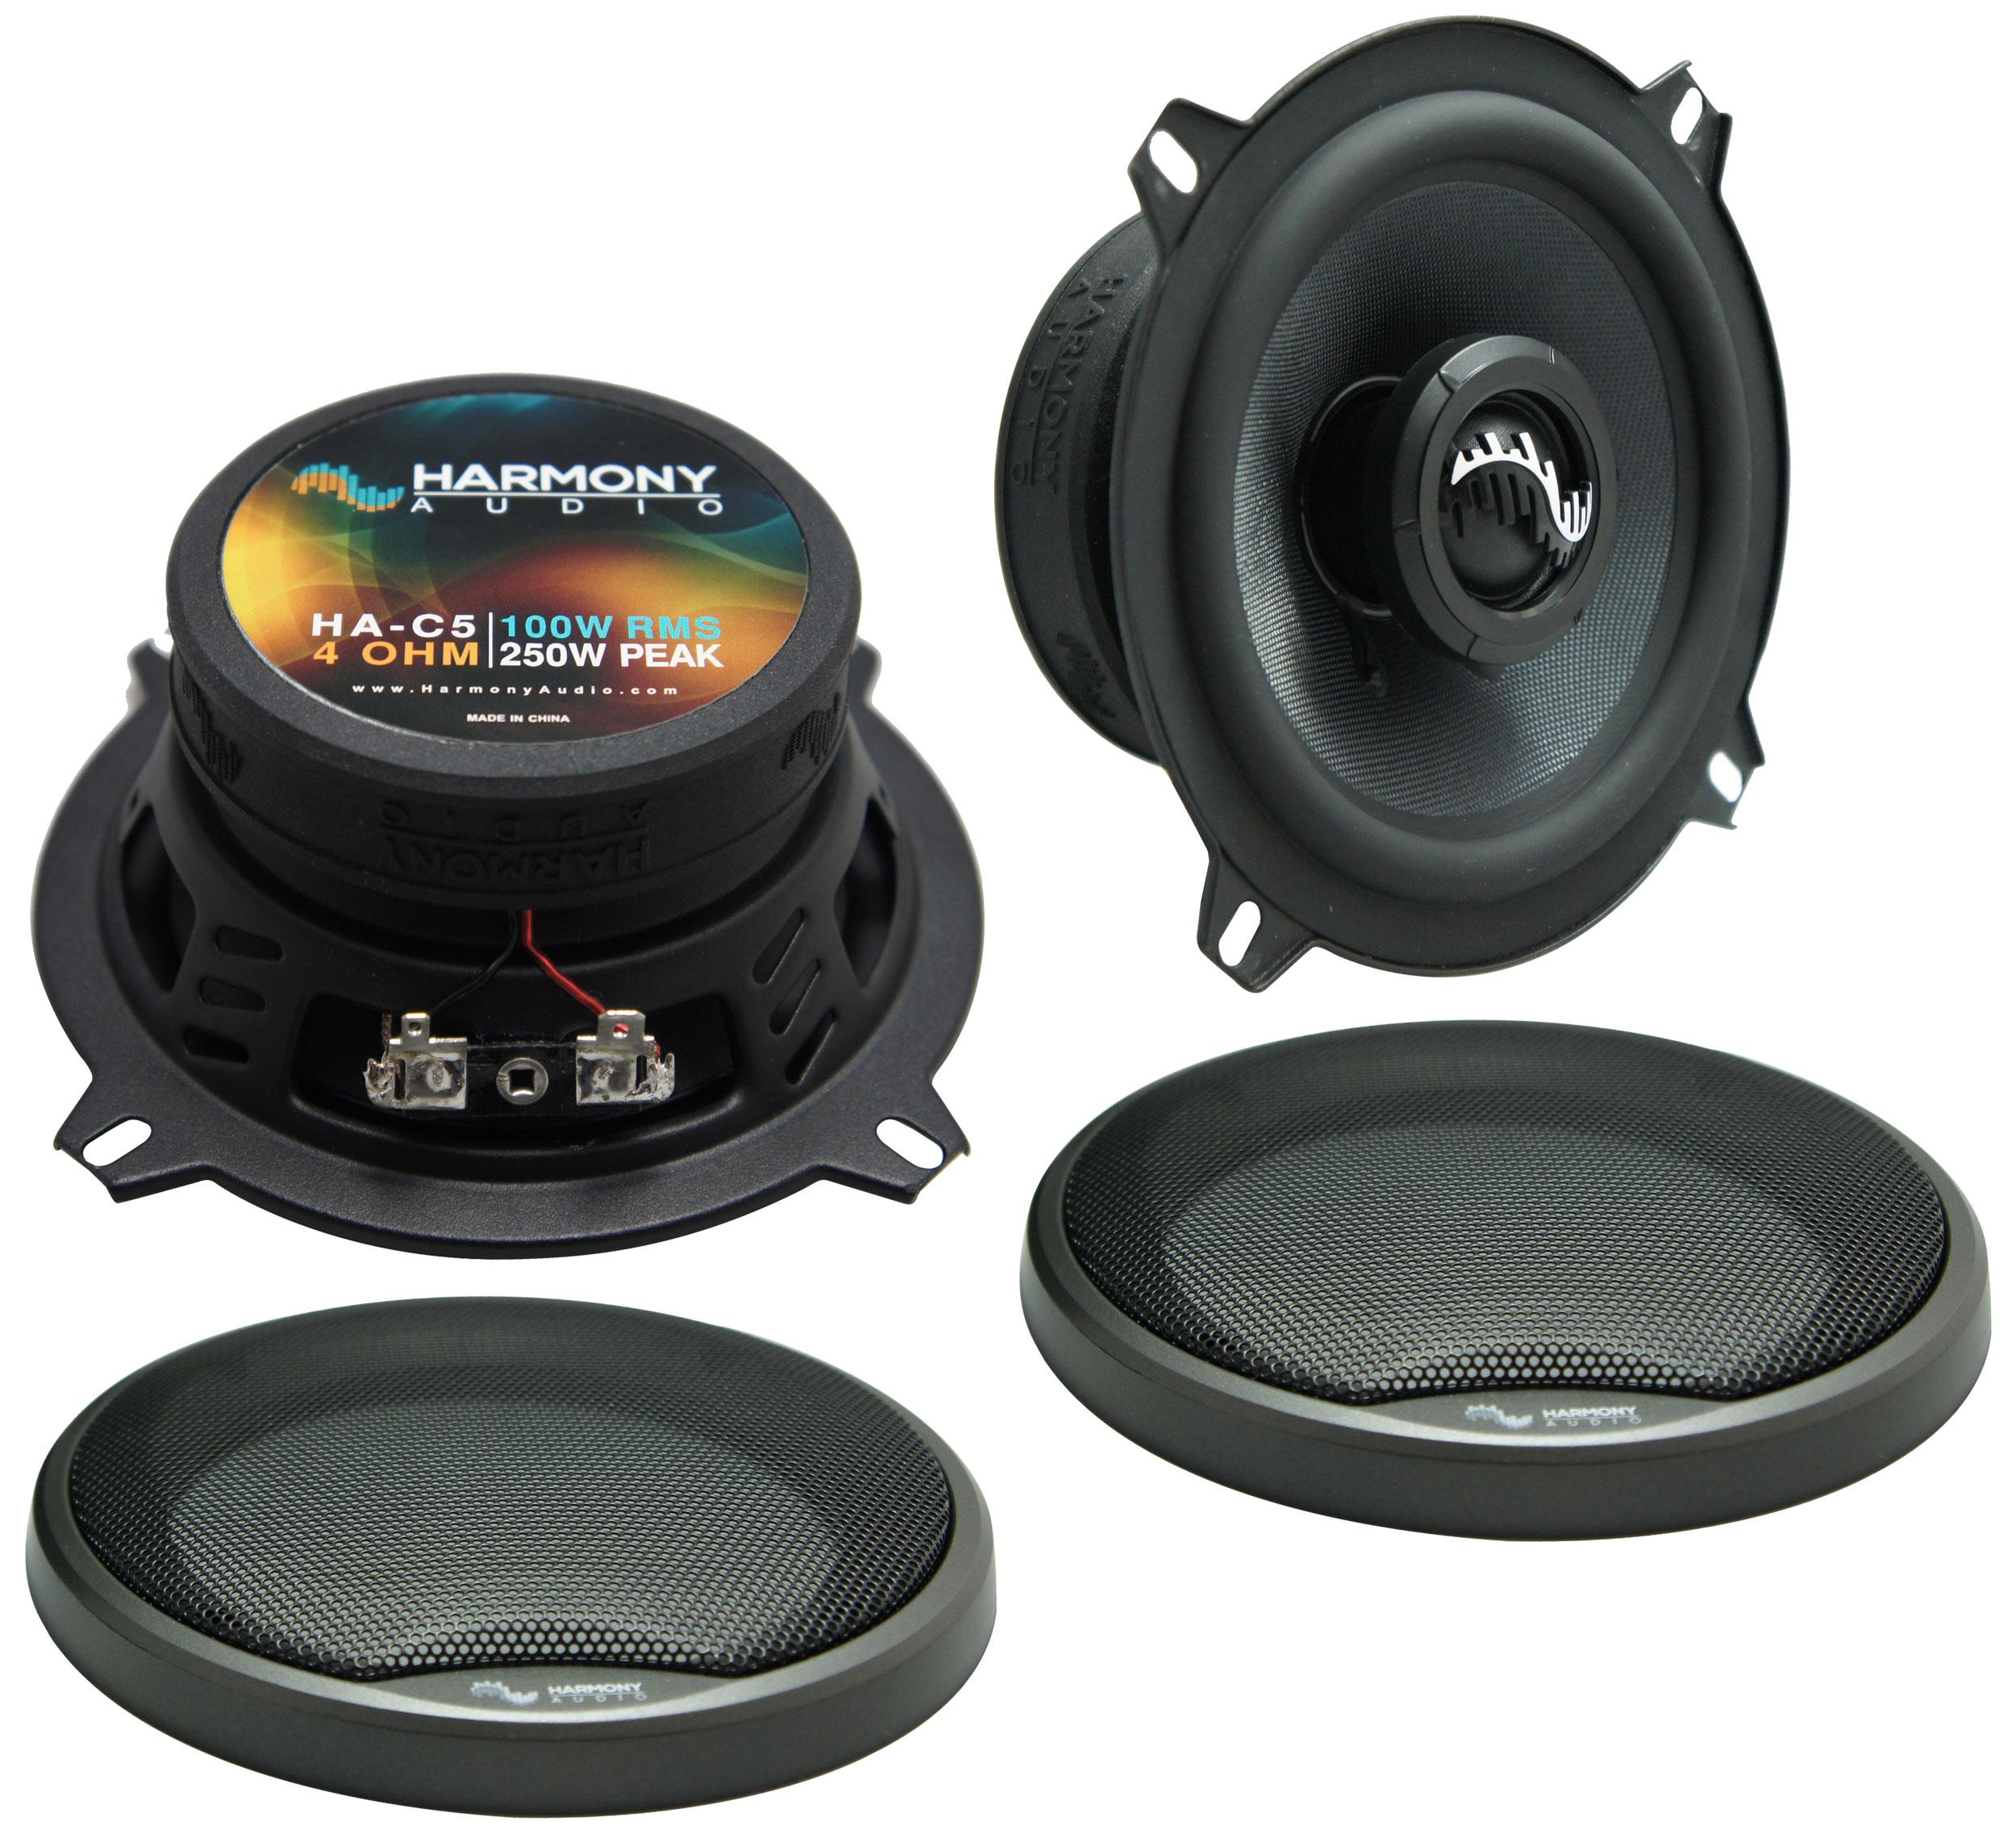 Fits Cadillac Escalade 2003-2006 Front Door Replacement Harmony HA-C5 Premium Speakers